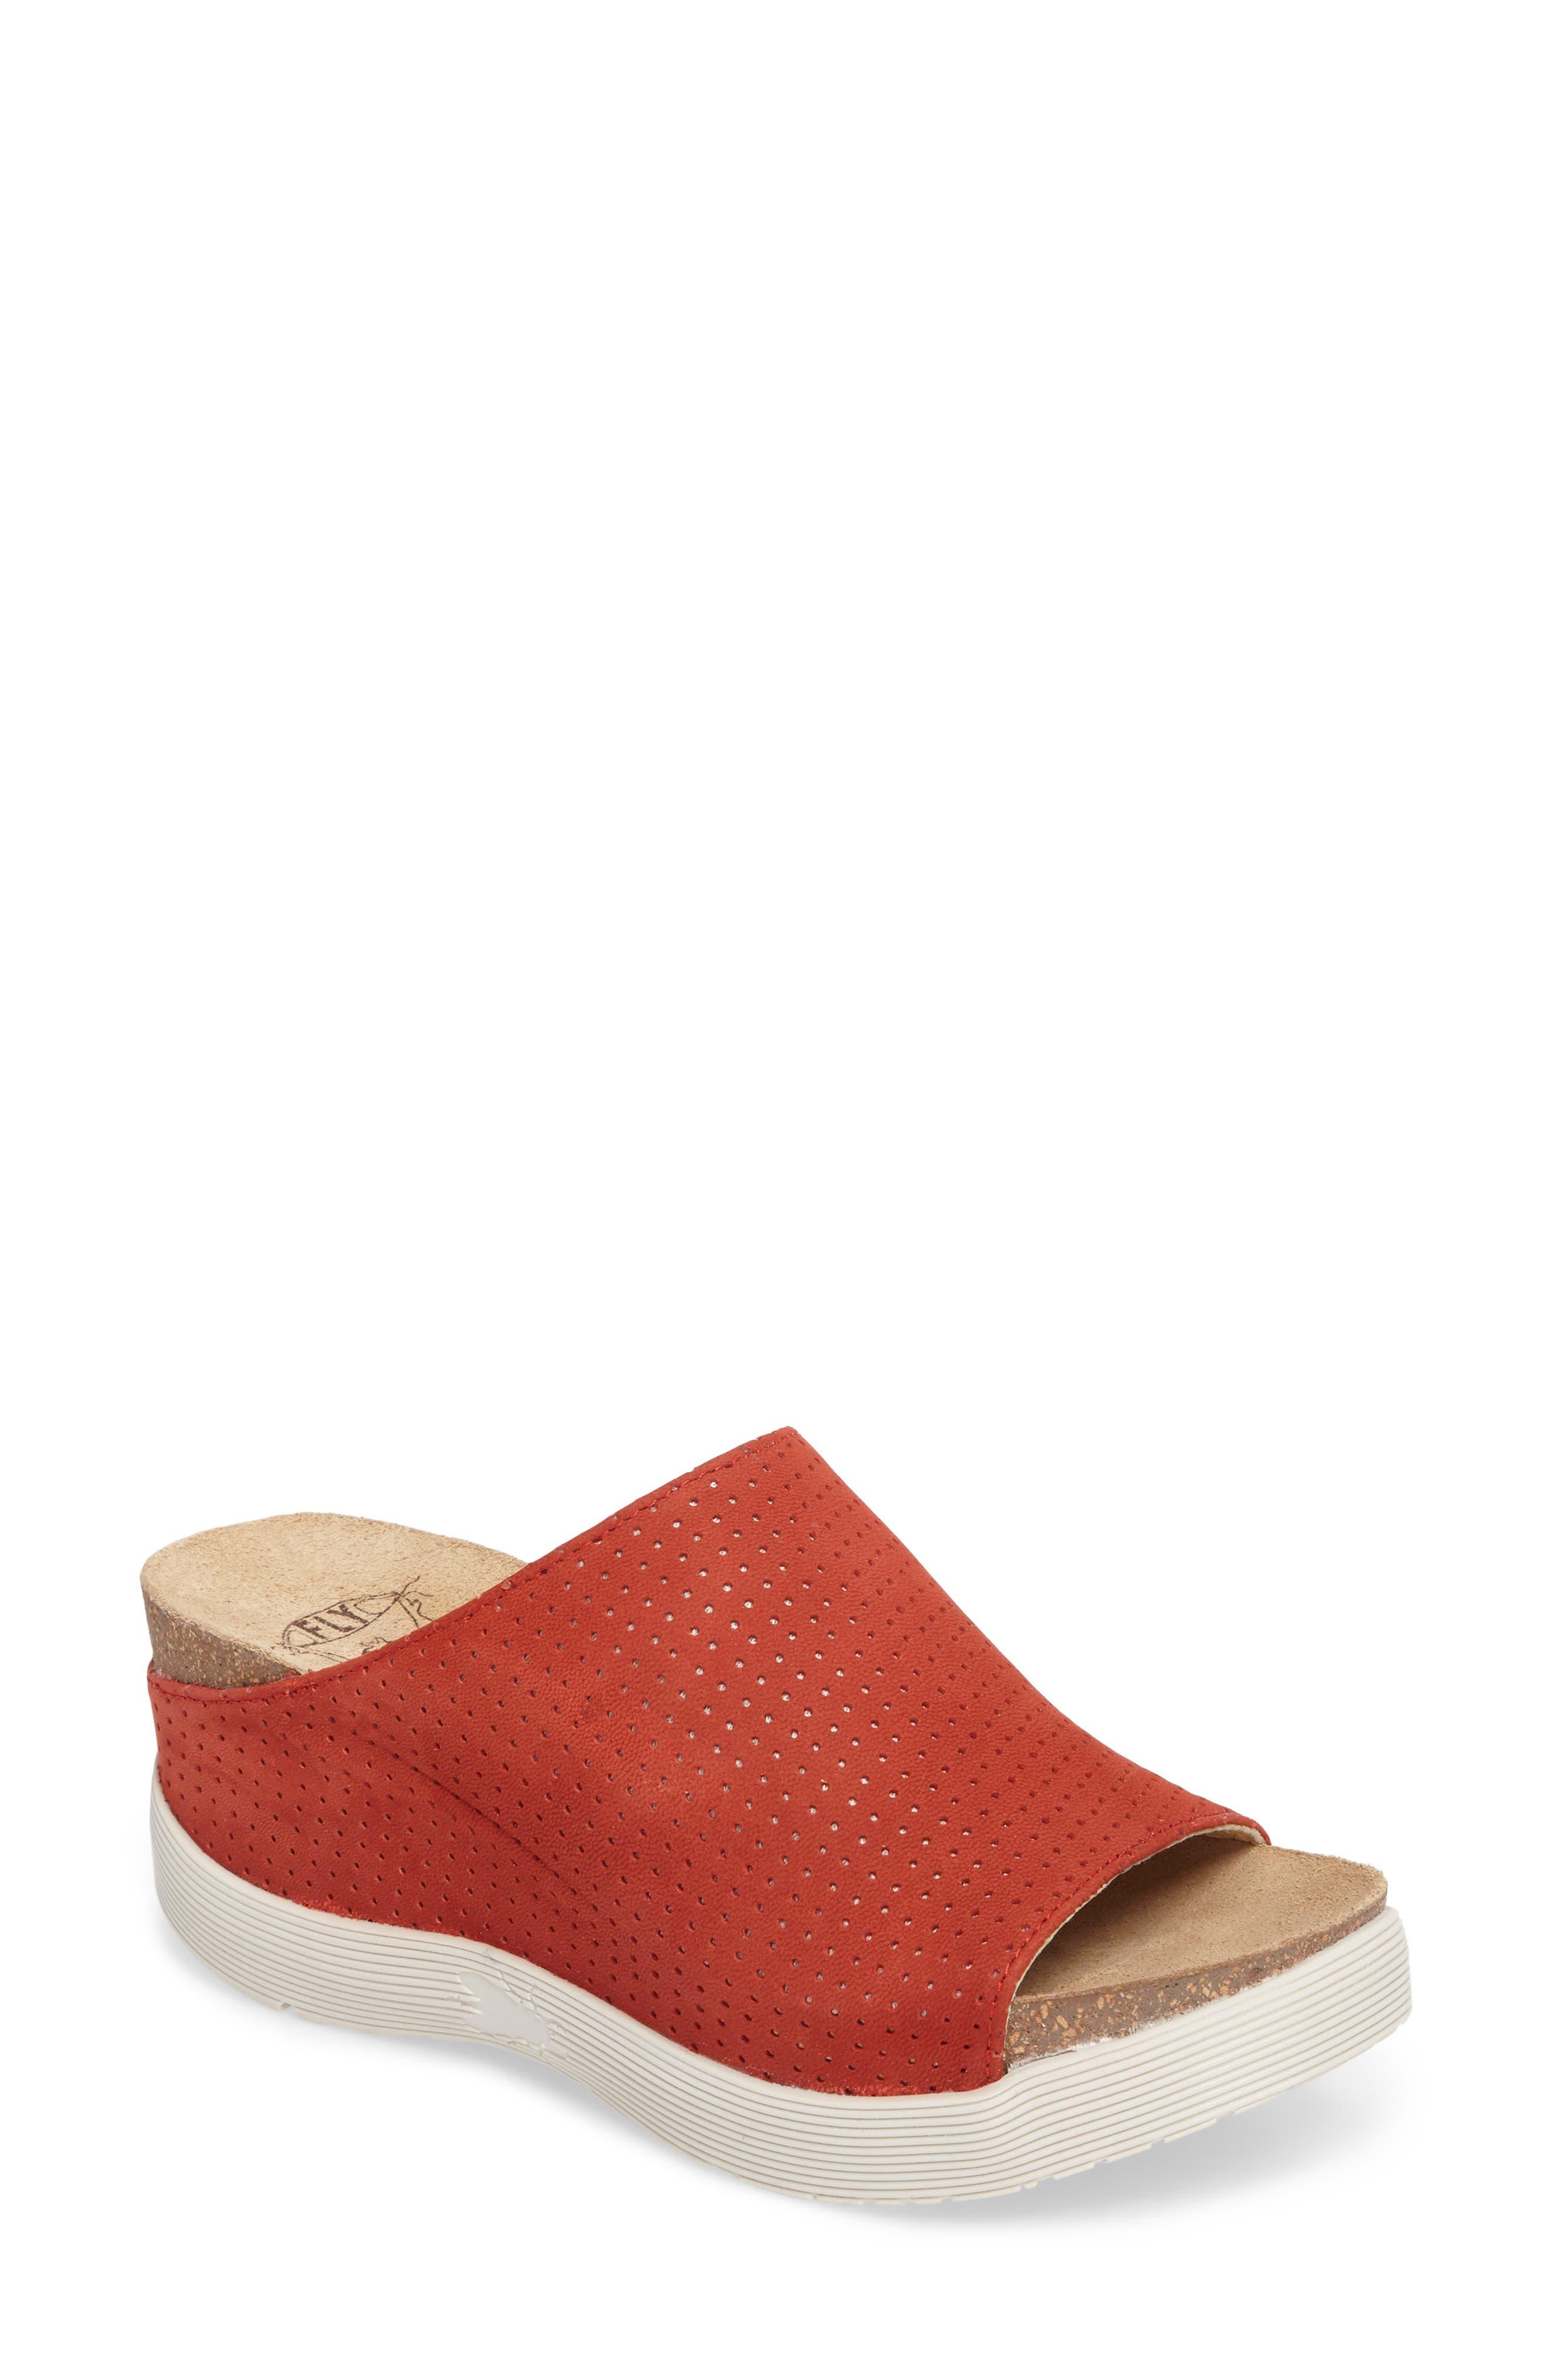 Fly London Whin Platform Sandal (Women)